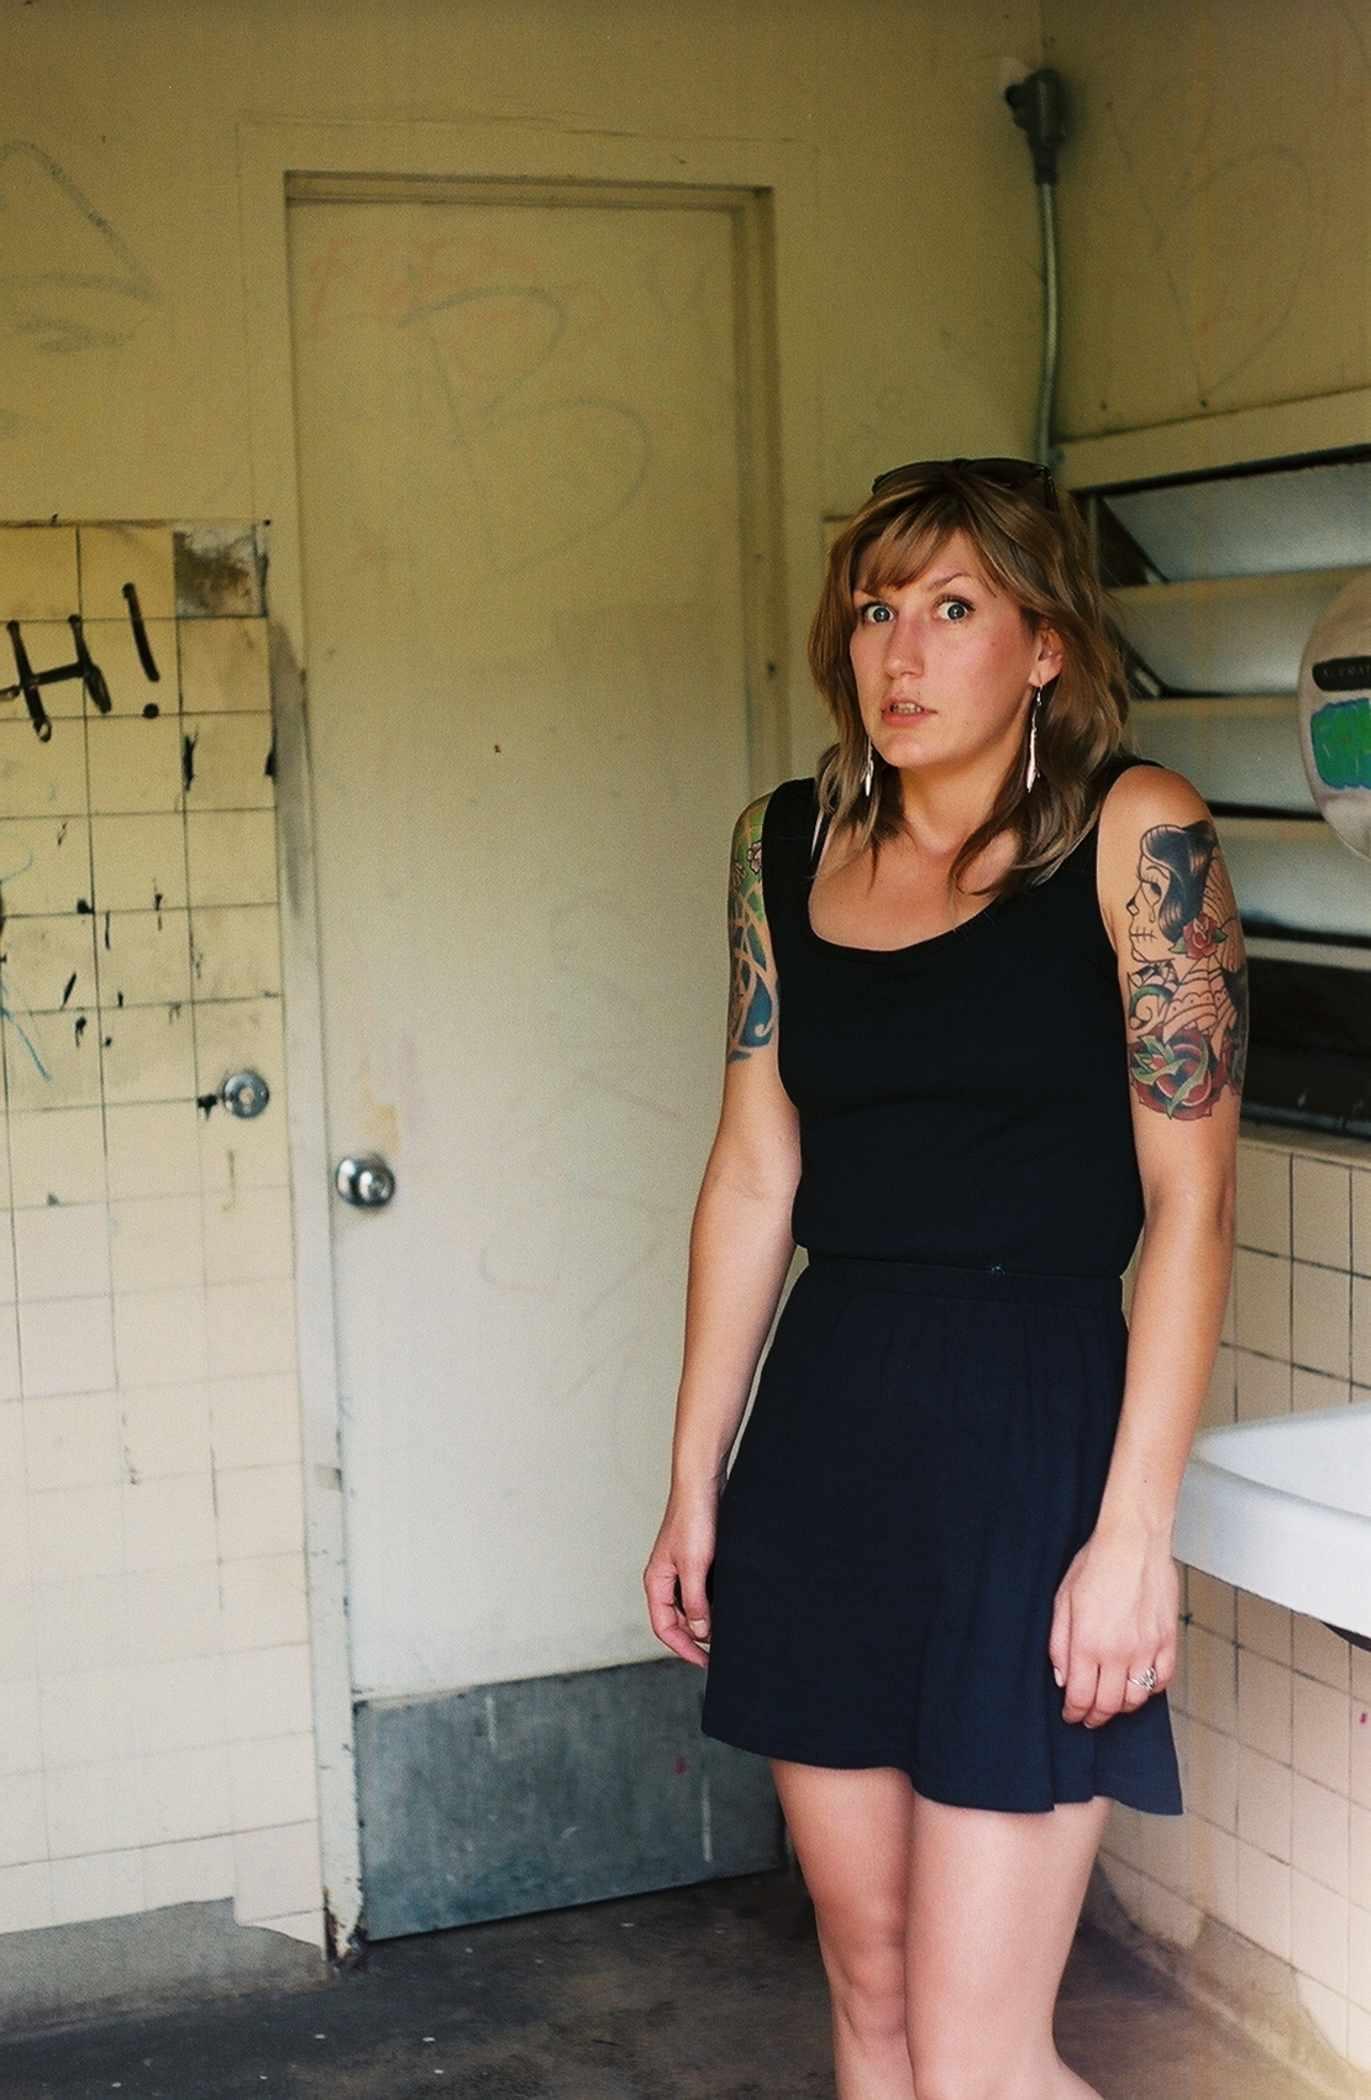 Horrific Dolores Park Bathroom Building to be Demolished   Uptown ...